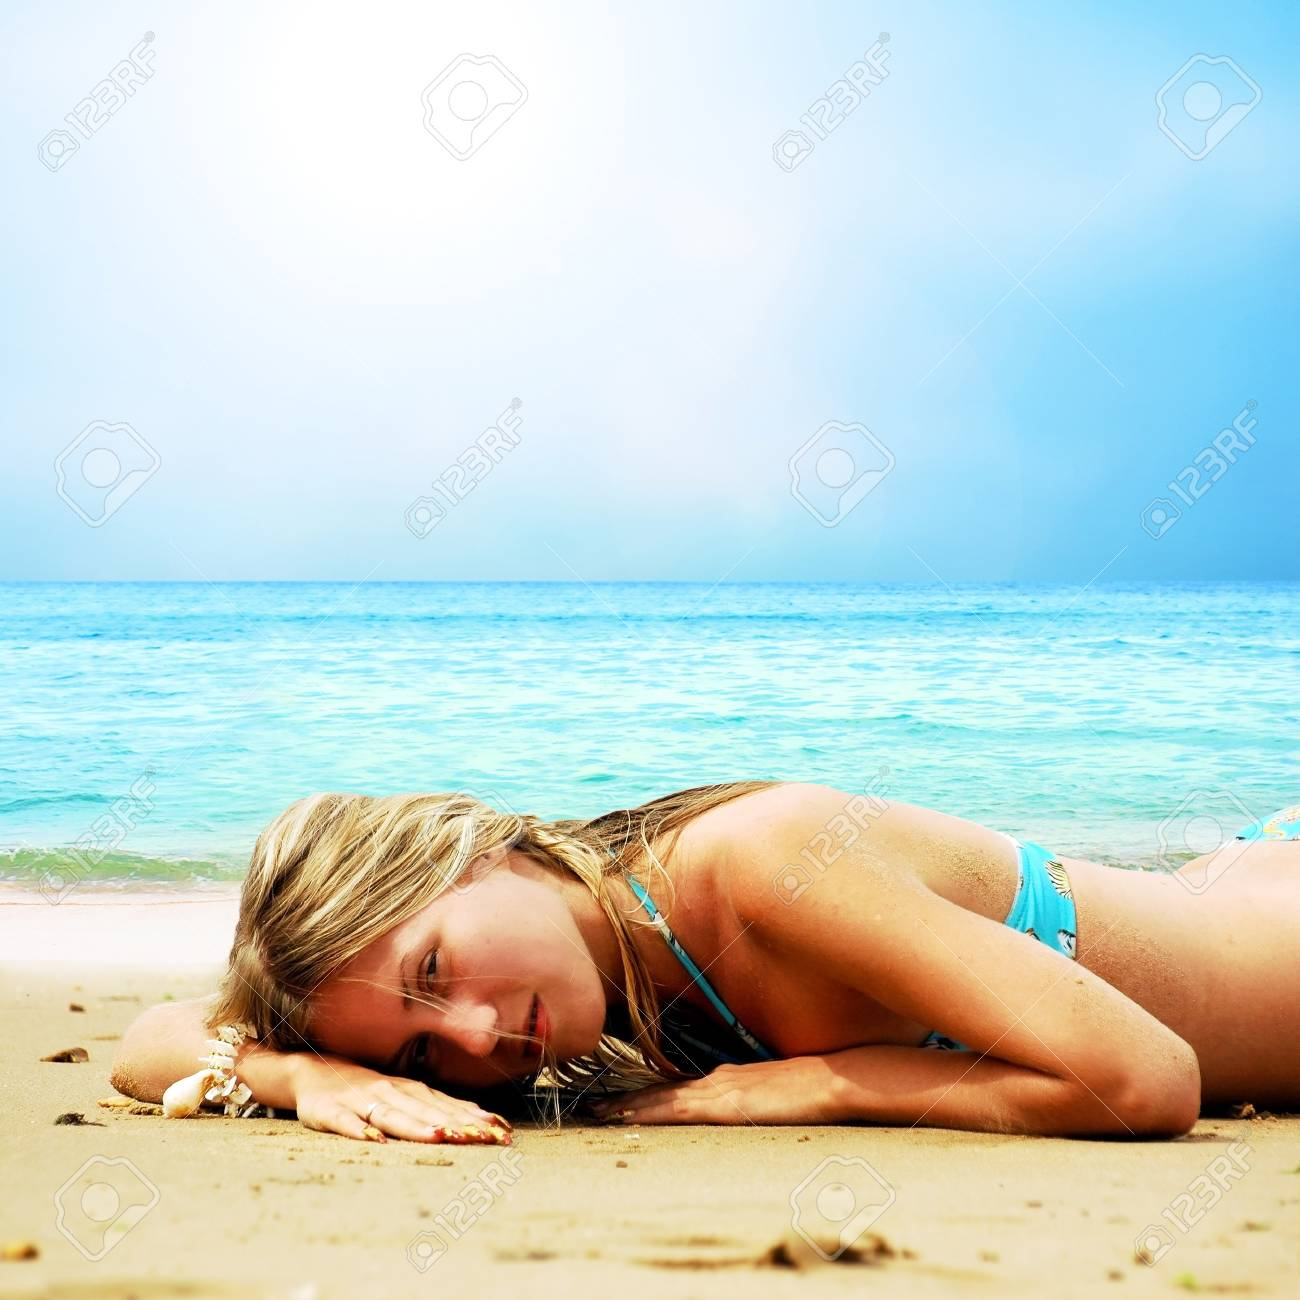 Young beautiful women on the sunny tropical beach in bikini Stock Photo - 8590657